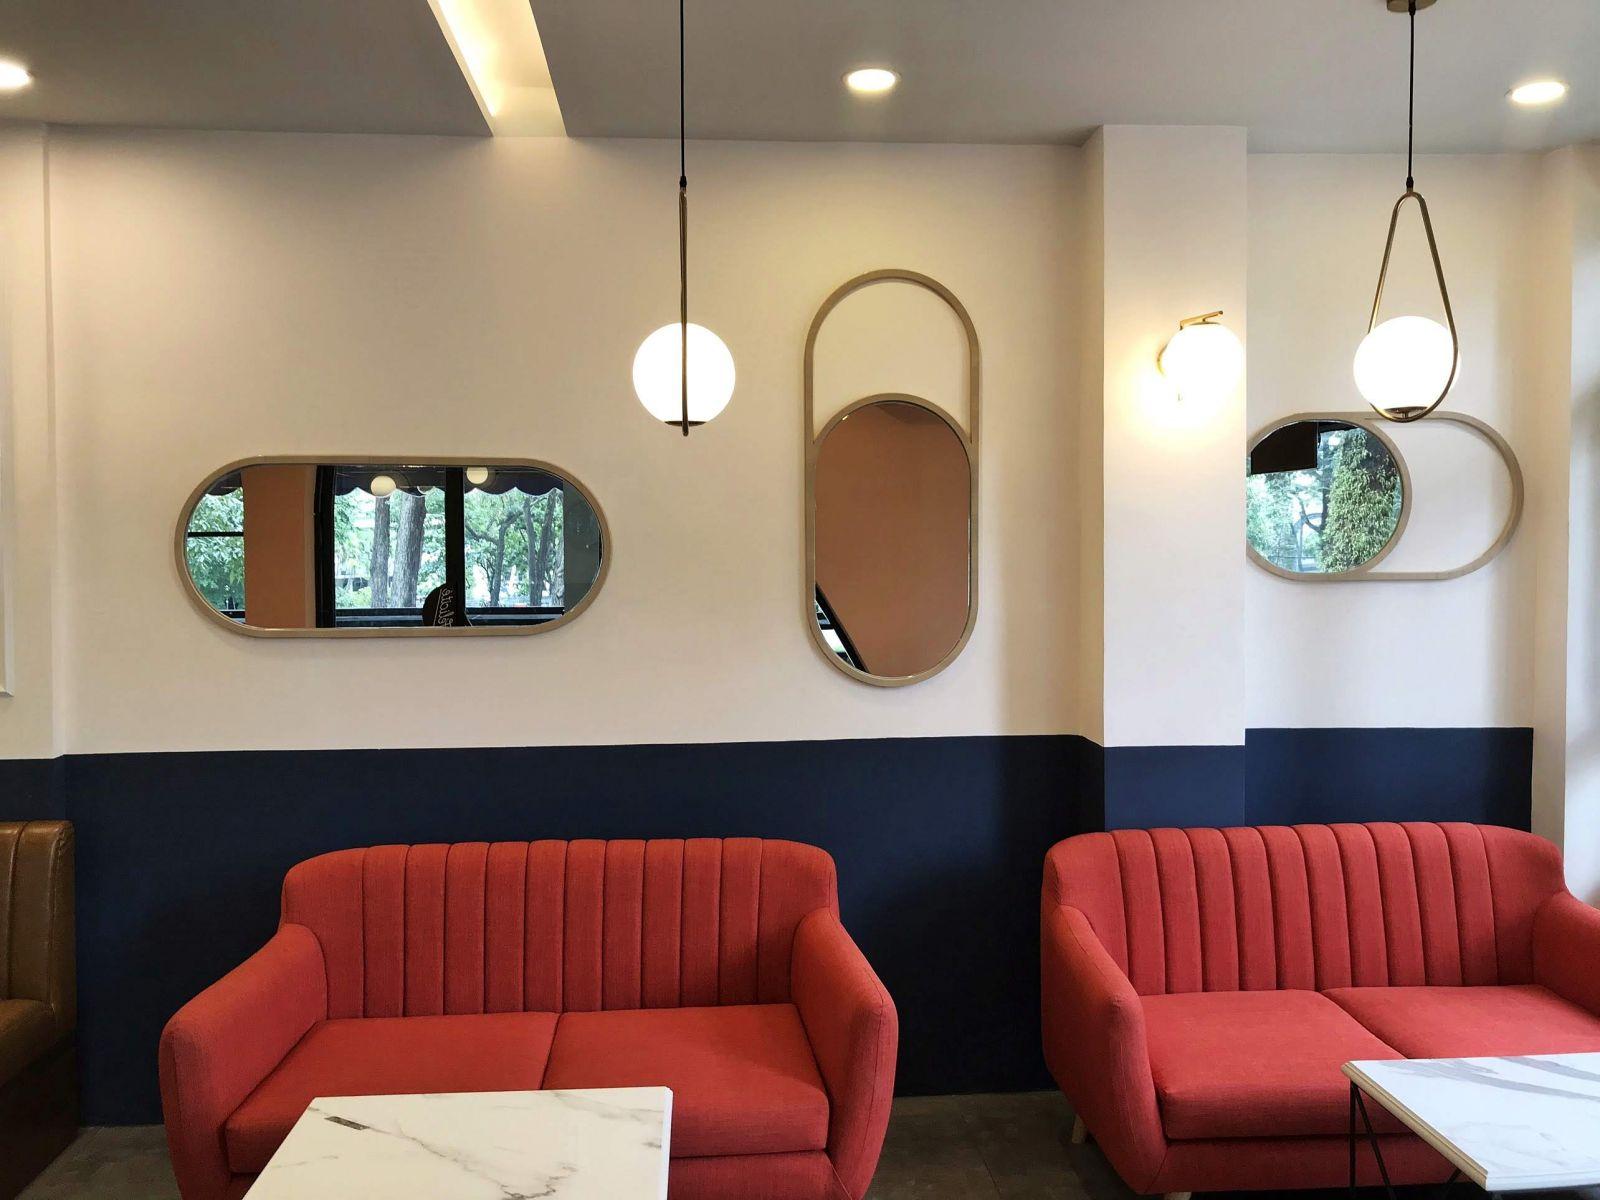 noi-that-Felicite-Coffee&Eatery-42-Tran-Cao-Van-Q3-11